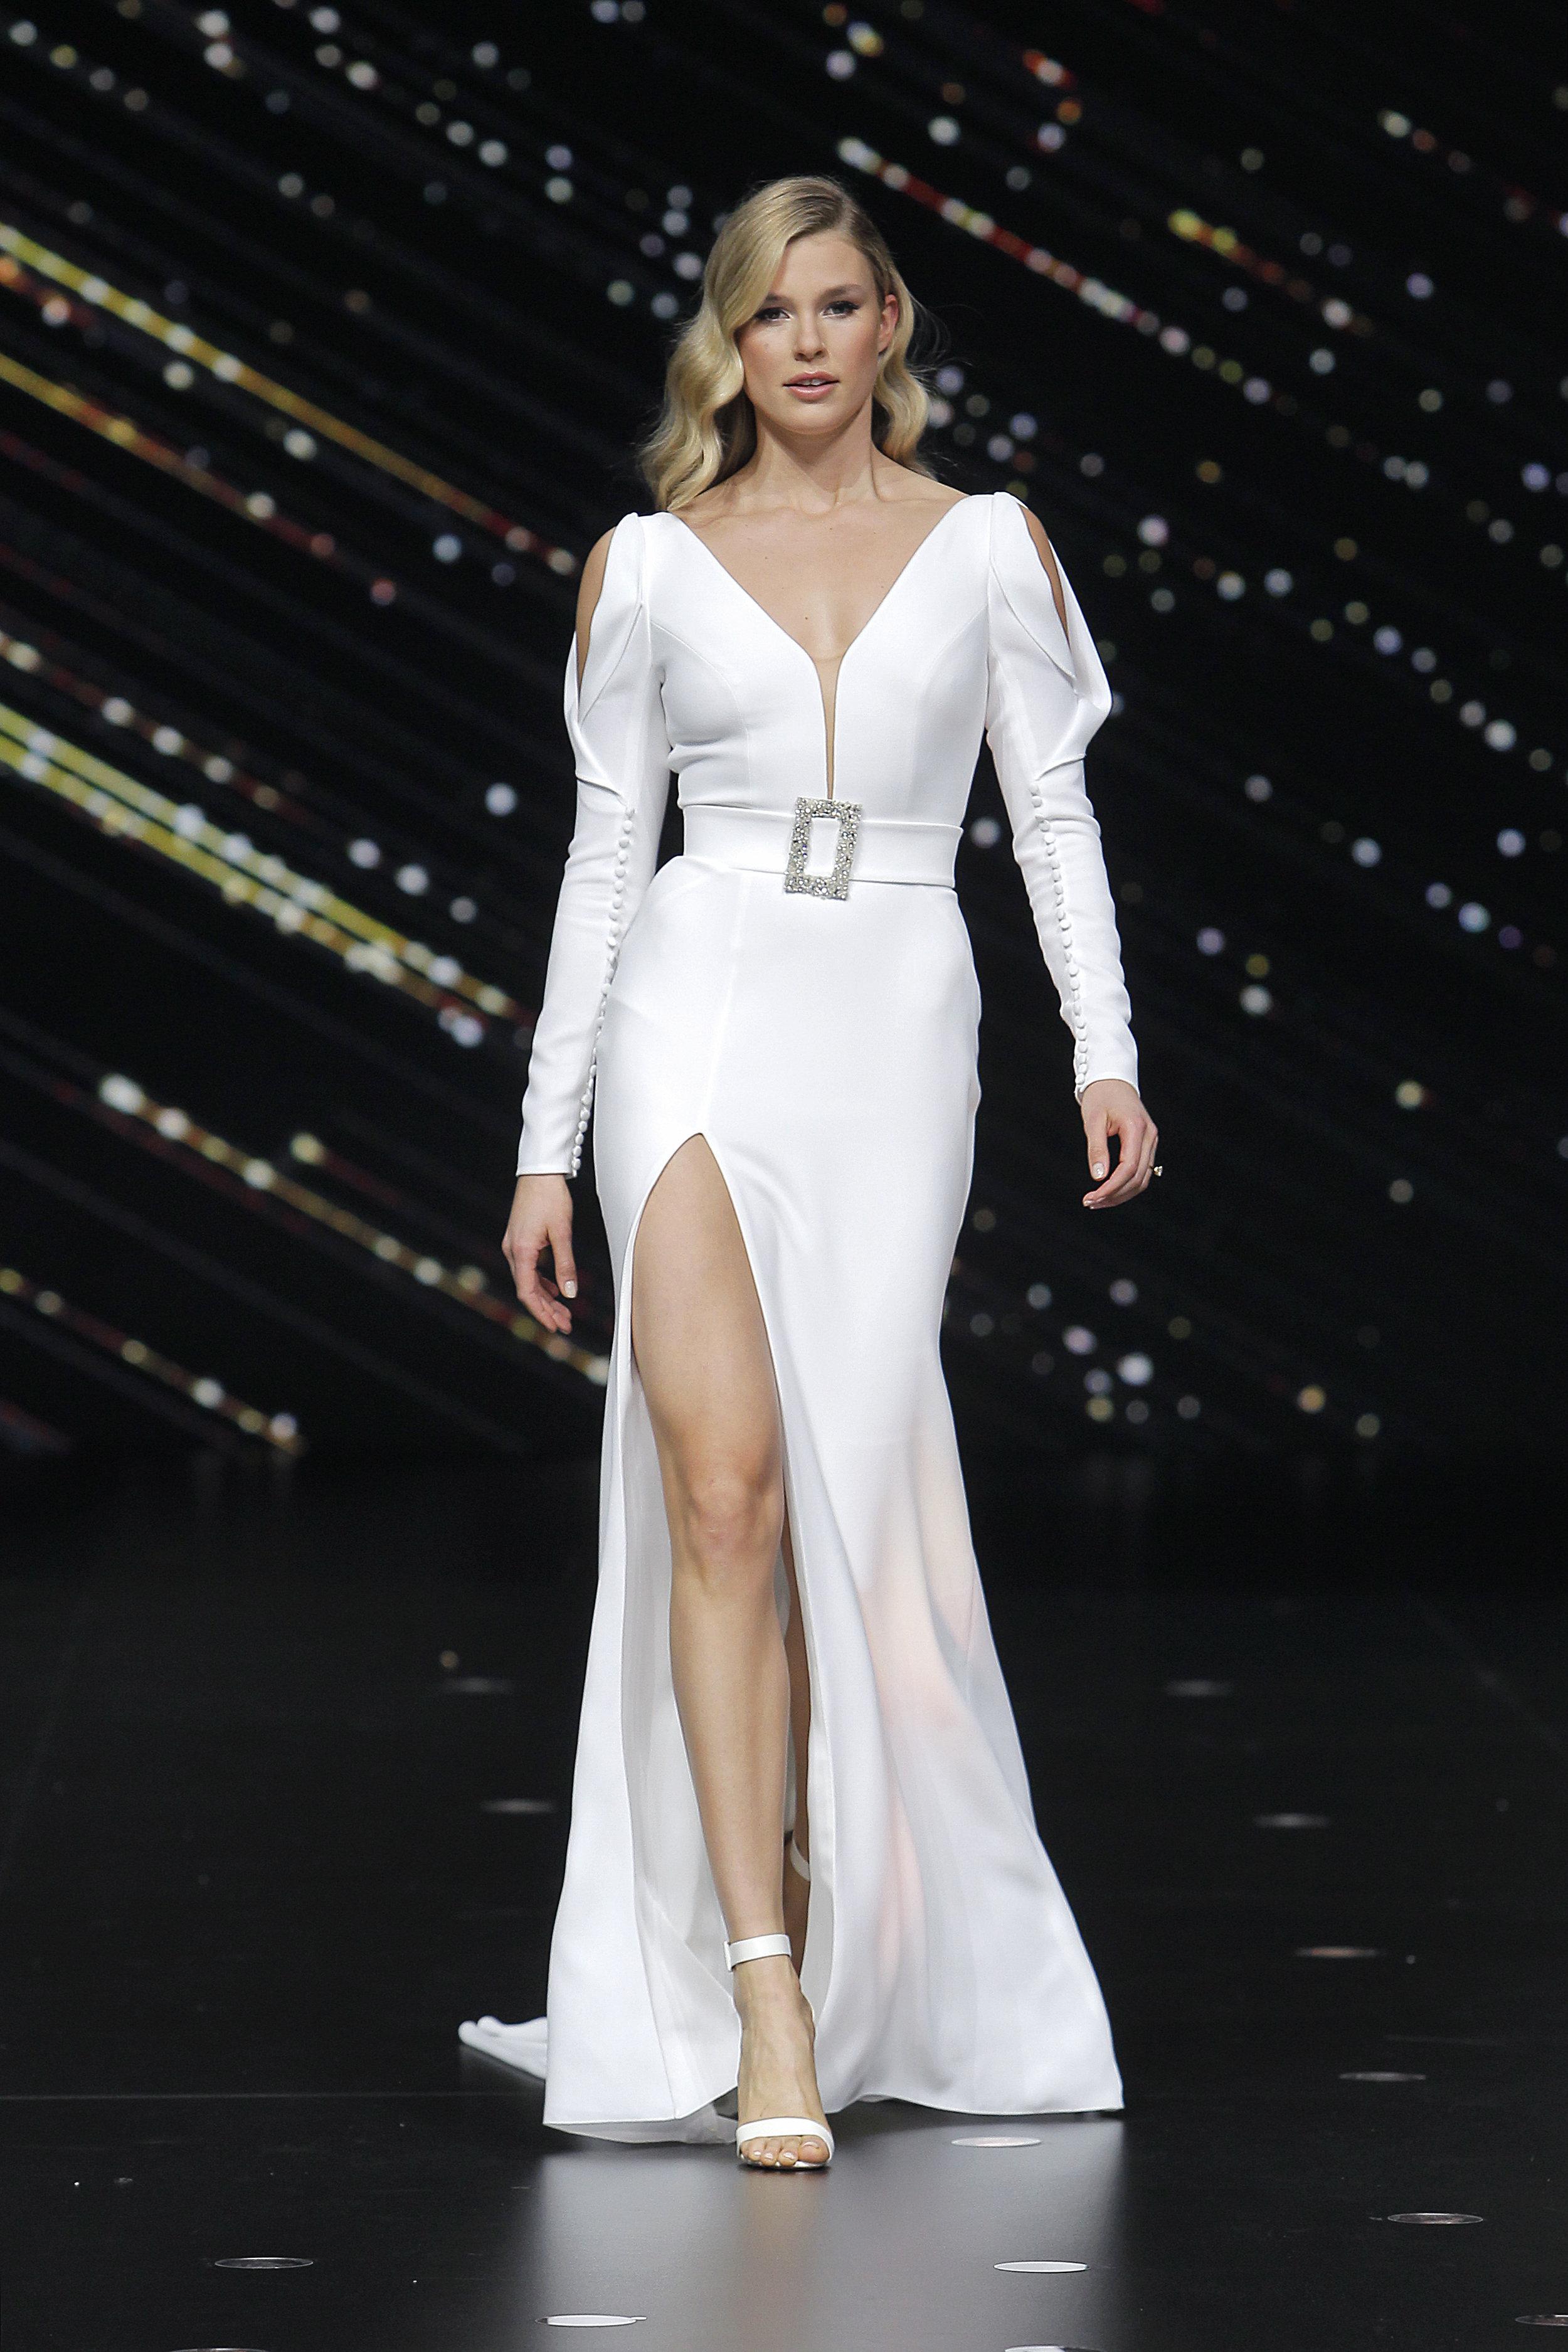 Diseñador: Pronovias - Pasarela:  Valmont Barcelona Bridal Fashion Week